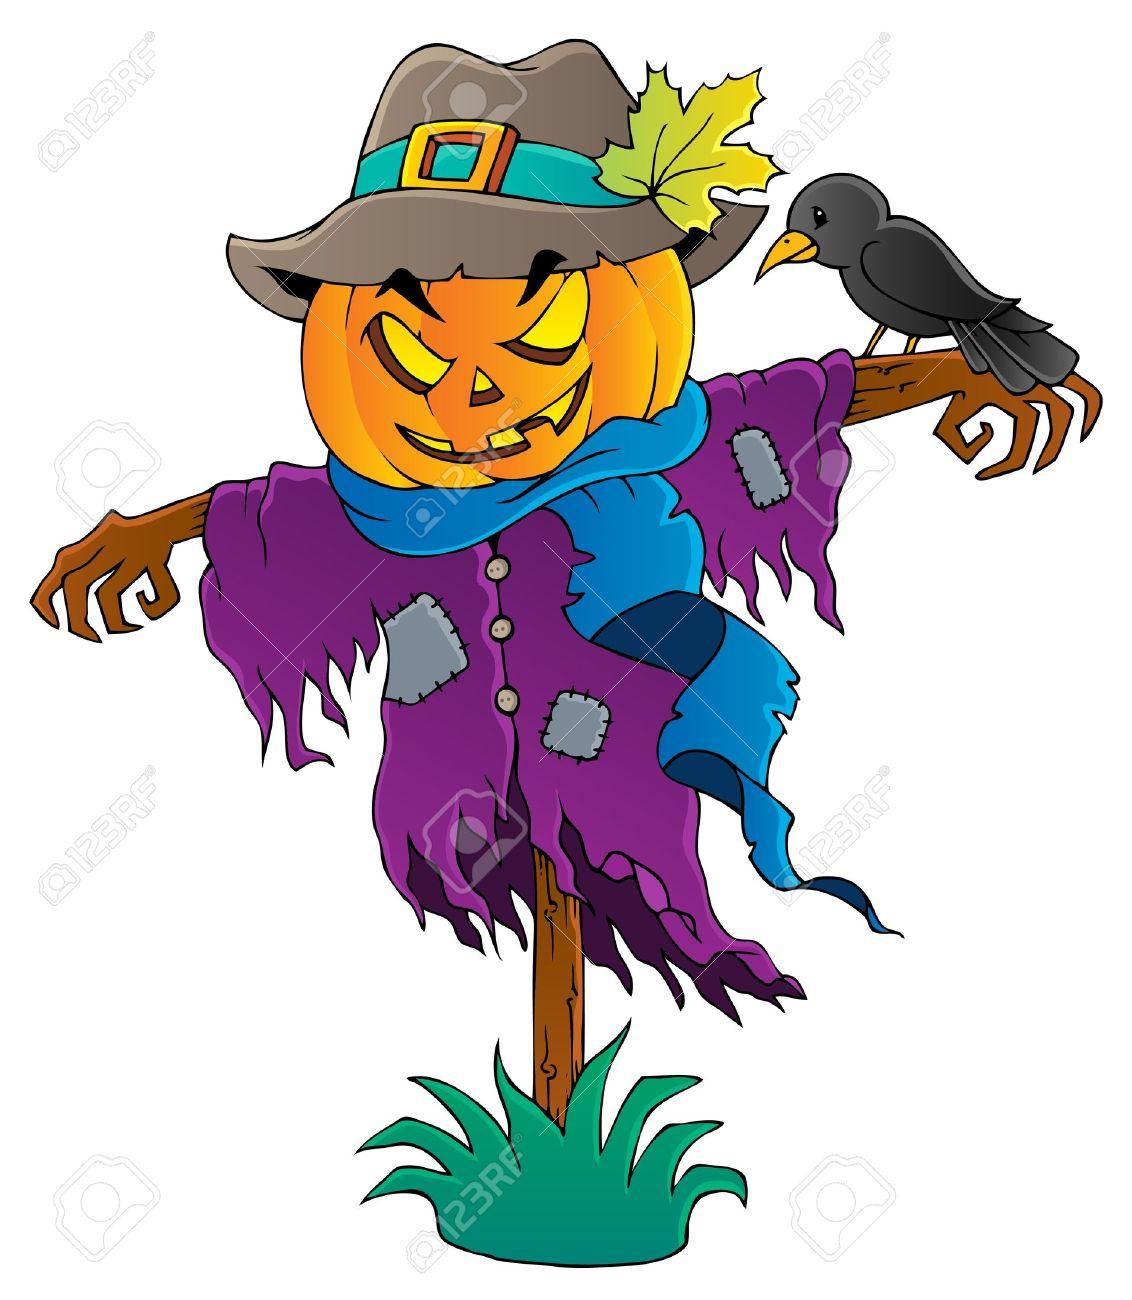 Scarecrow clipart creepy Fans Clipart scarecrow #25 art